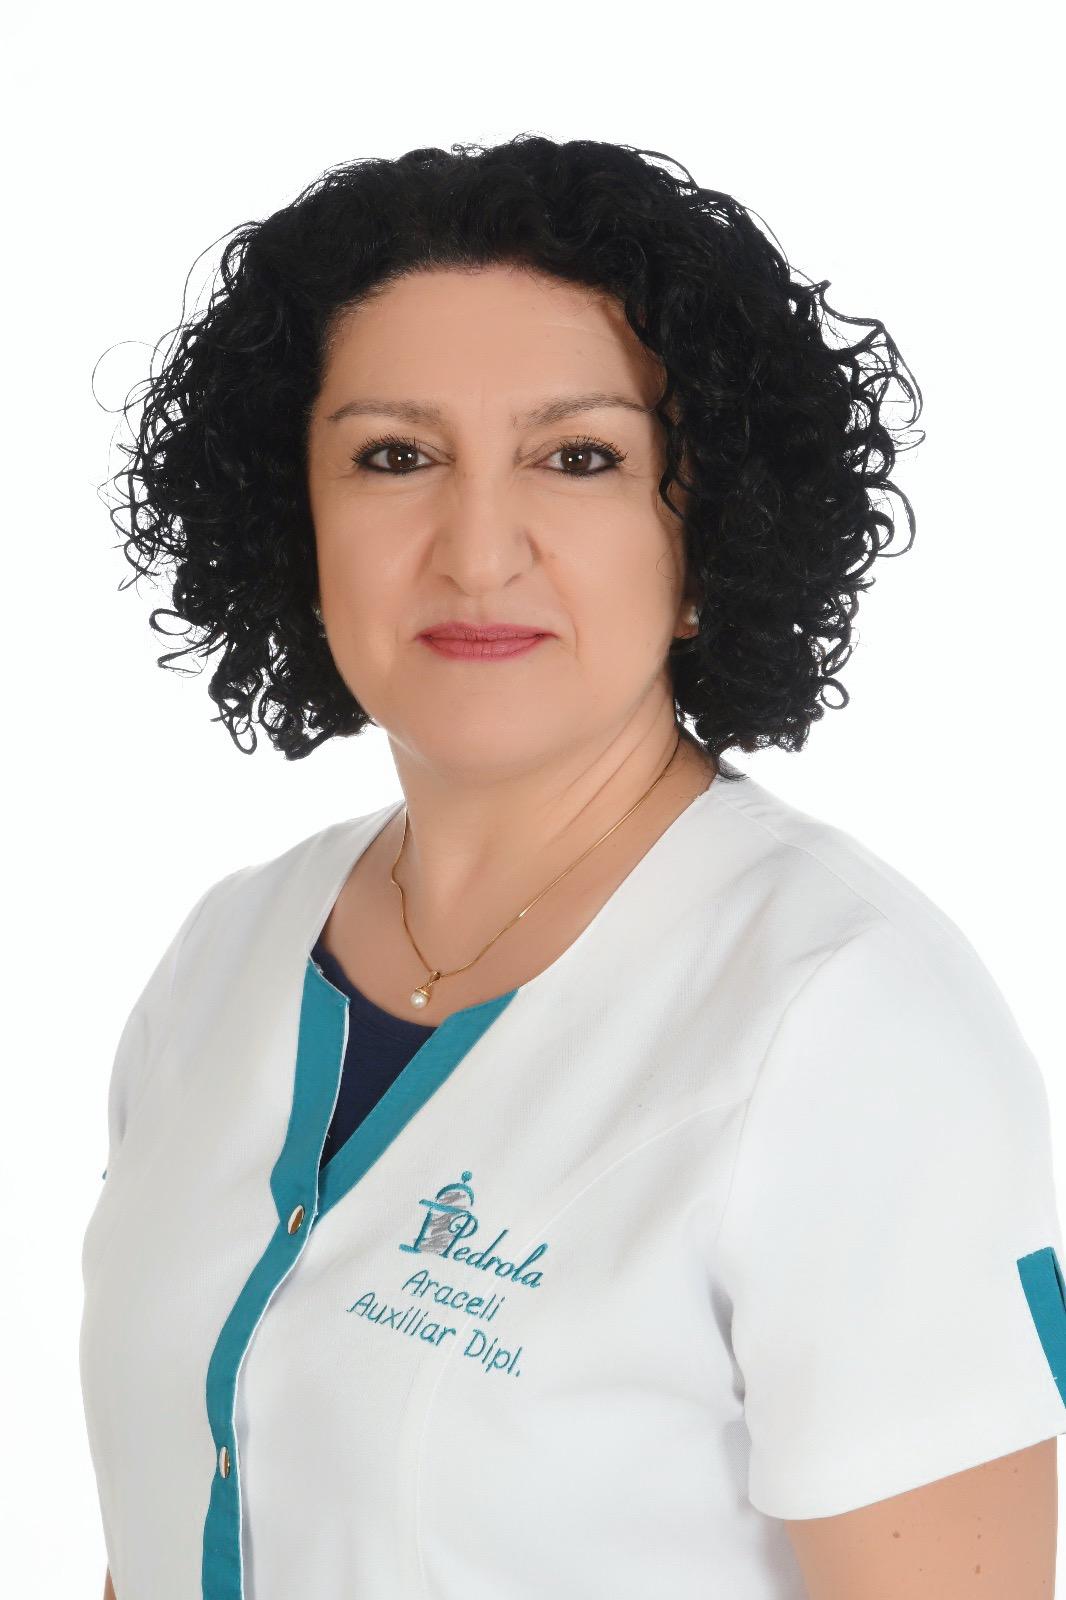 Araceli Aixart Balfegó